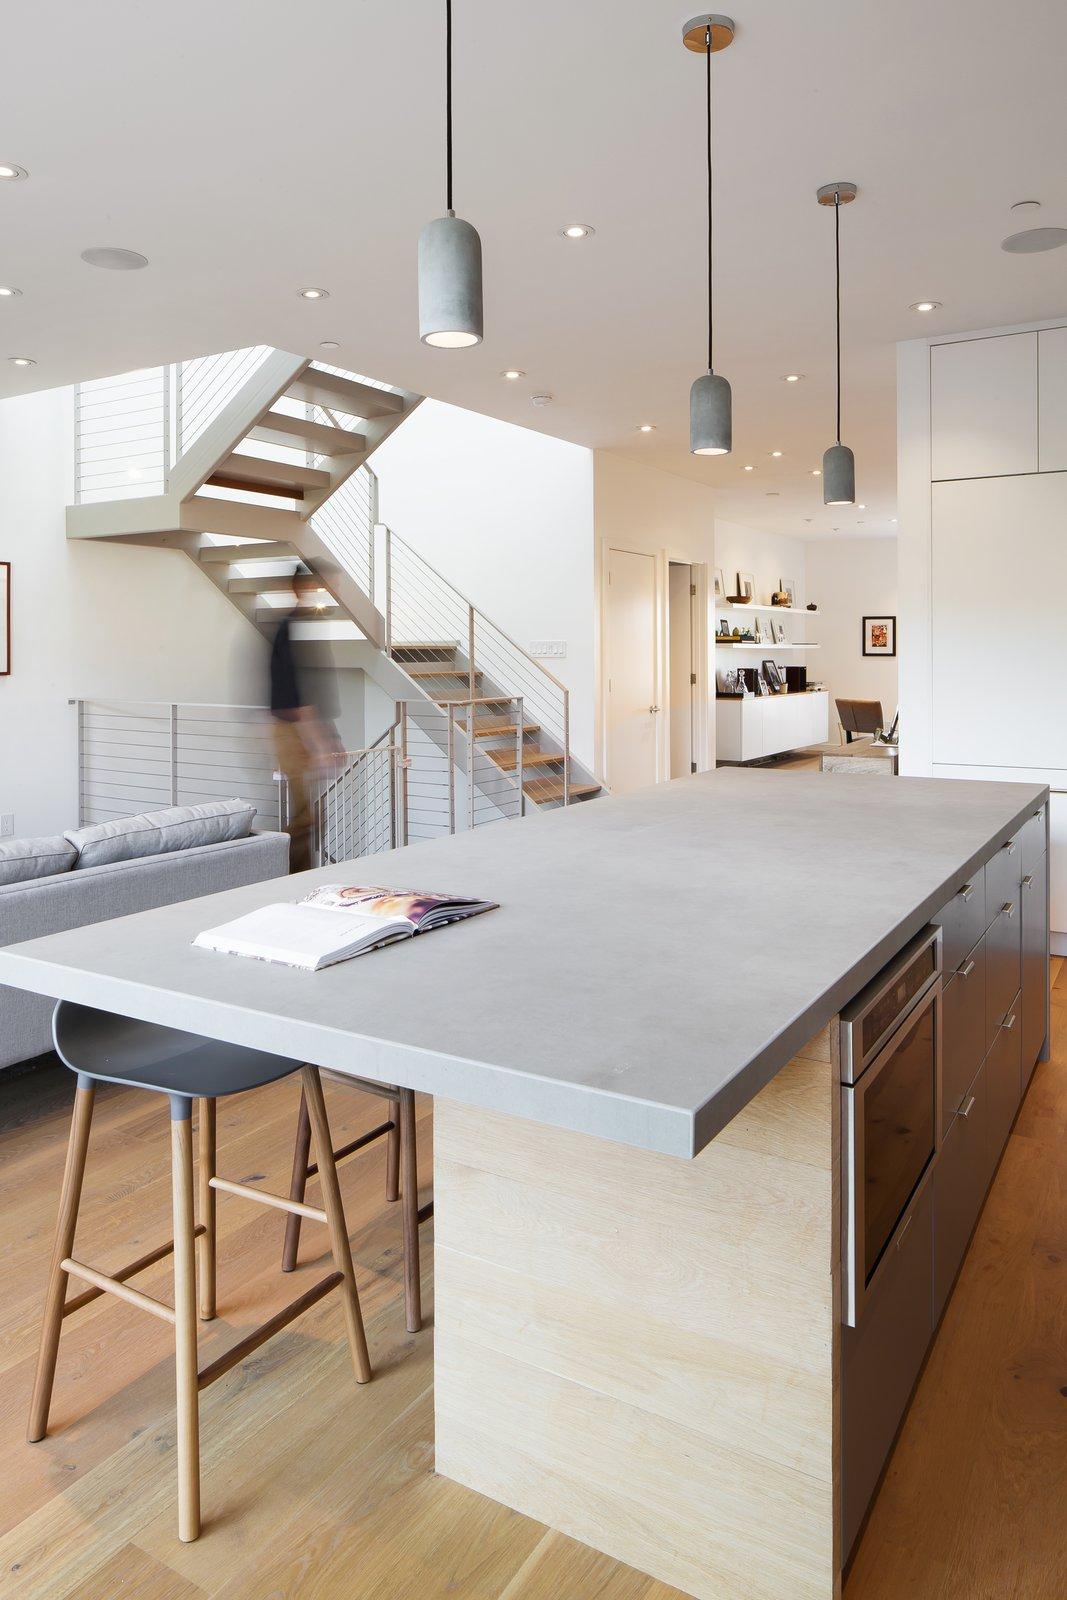 San Francisco Renovation kitchen island with grey quartz countertops and grey pendant lighting